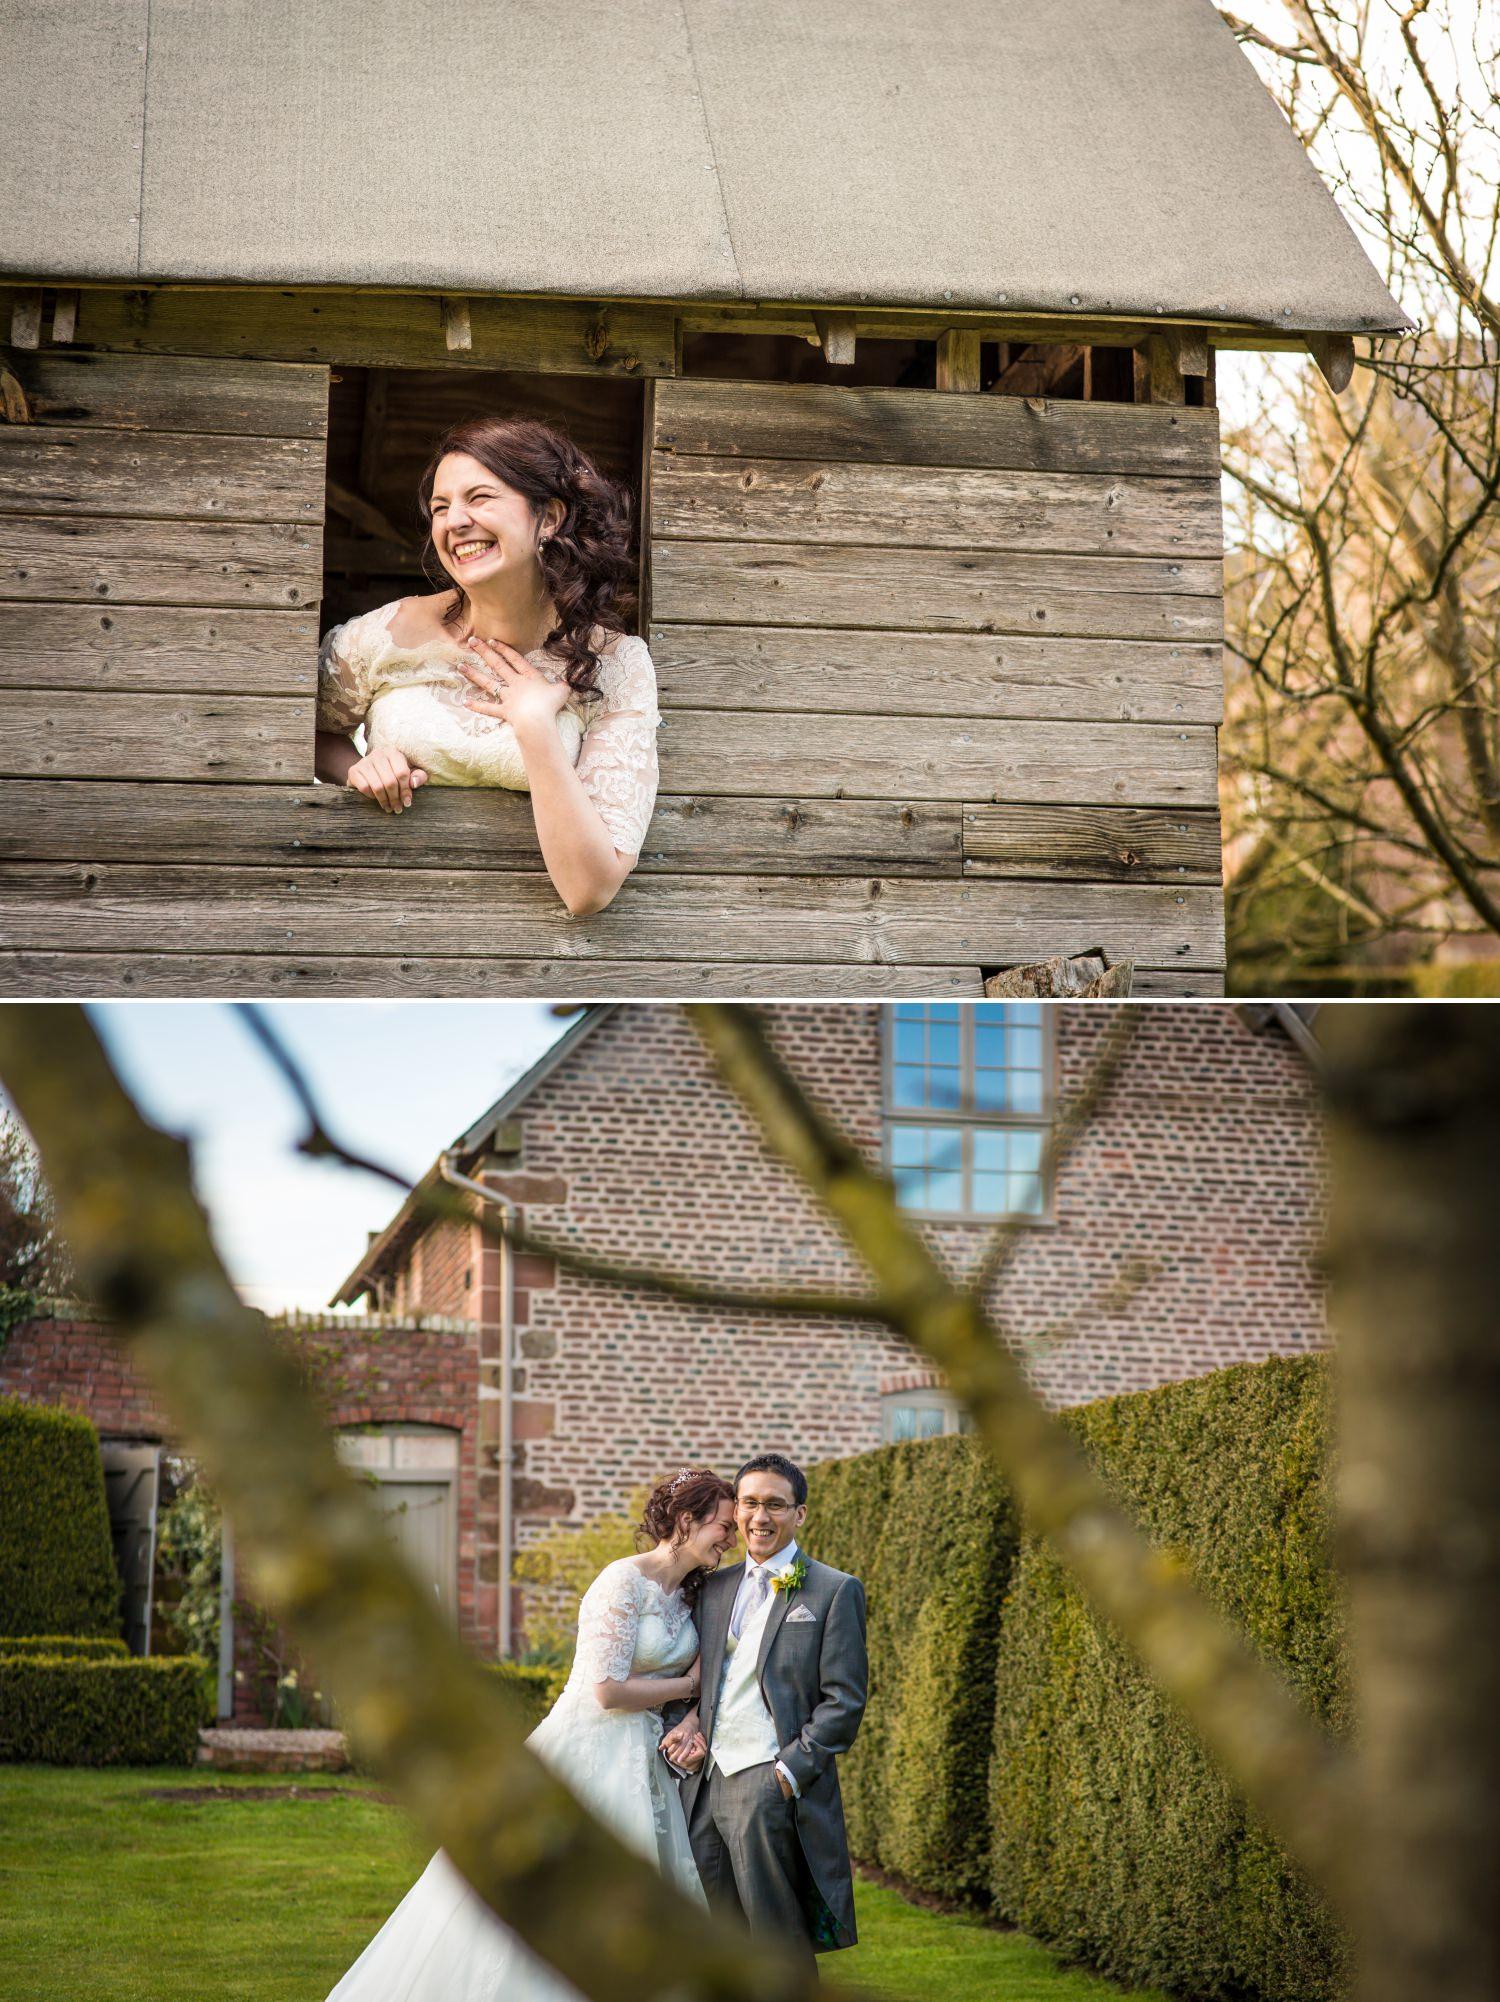 Wedding Photograph of couple having fun at Pimhill Barn, Shropshire